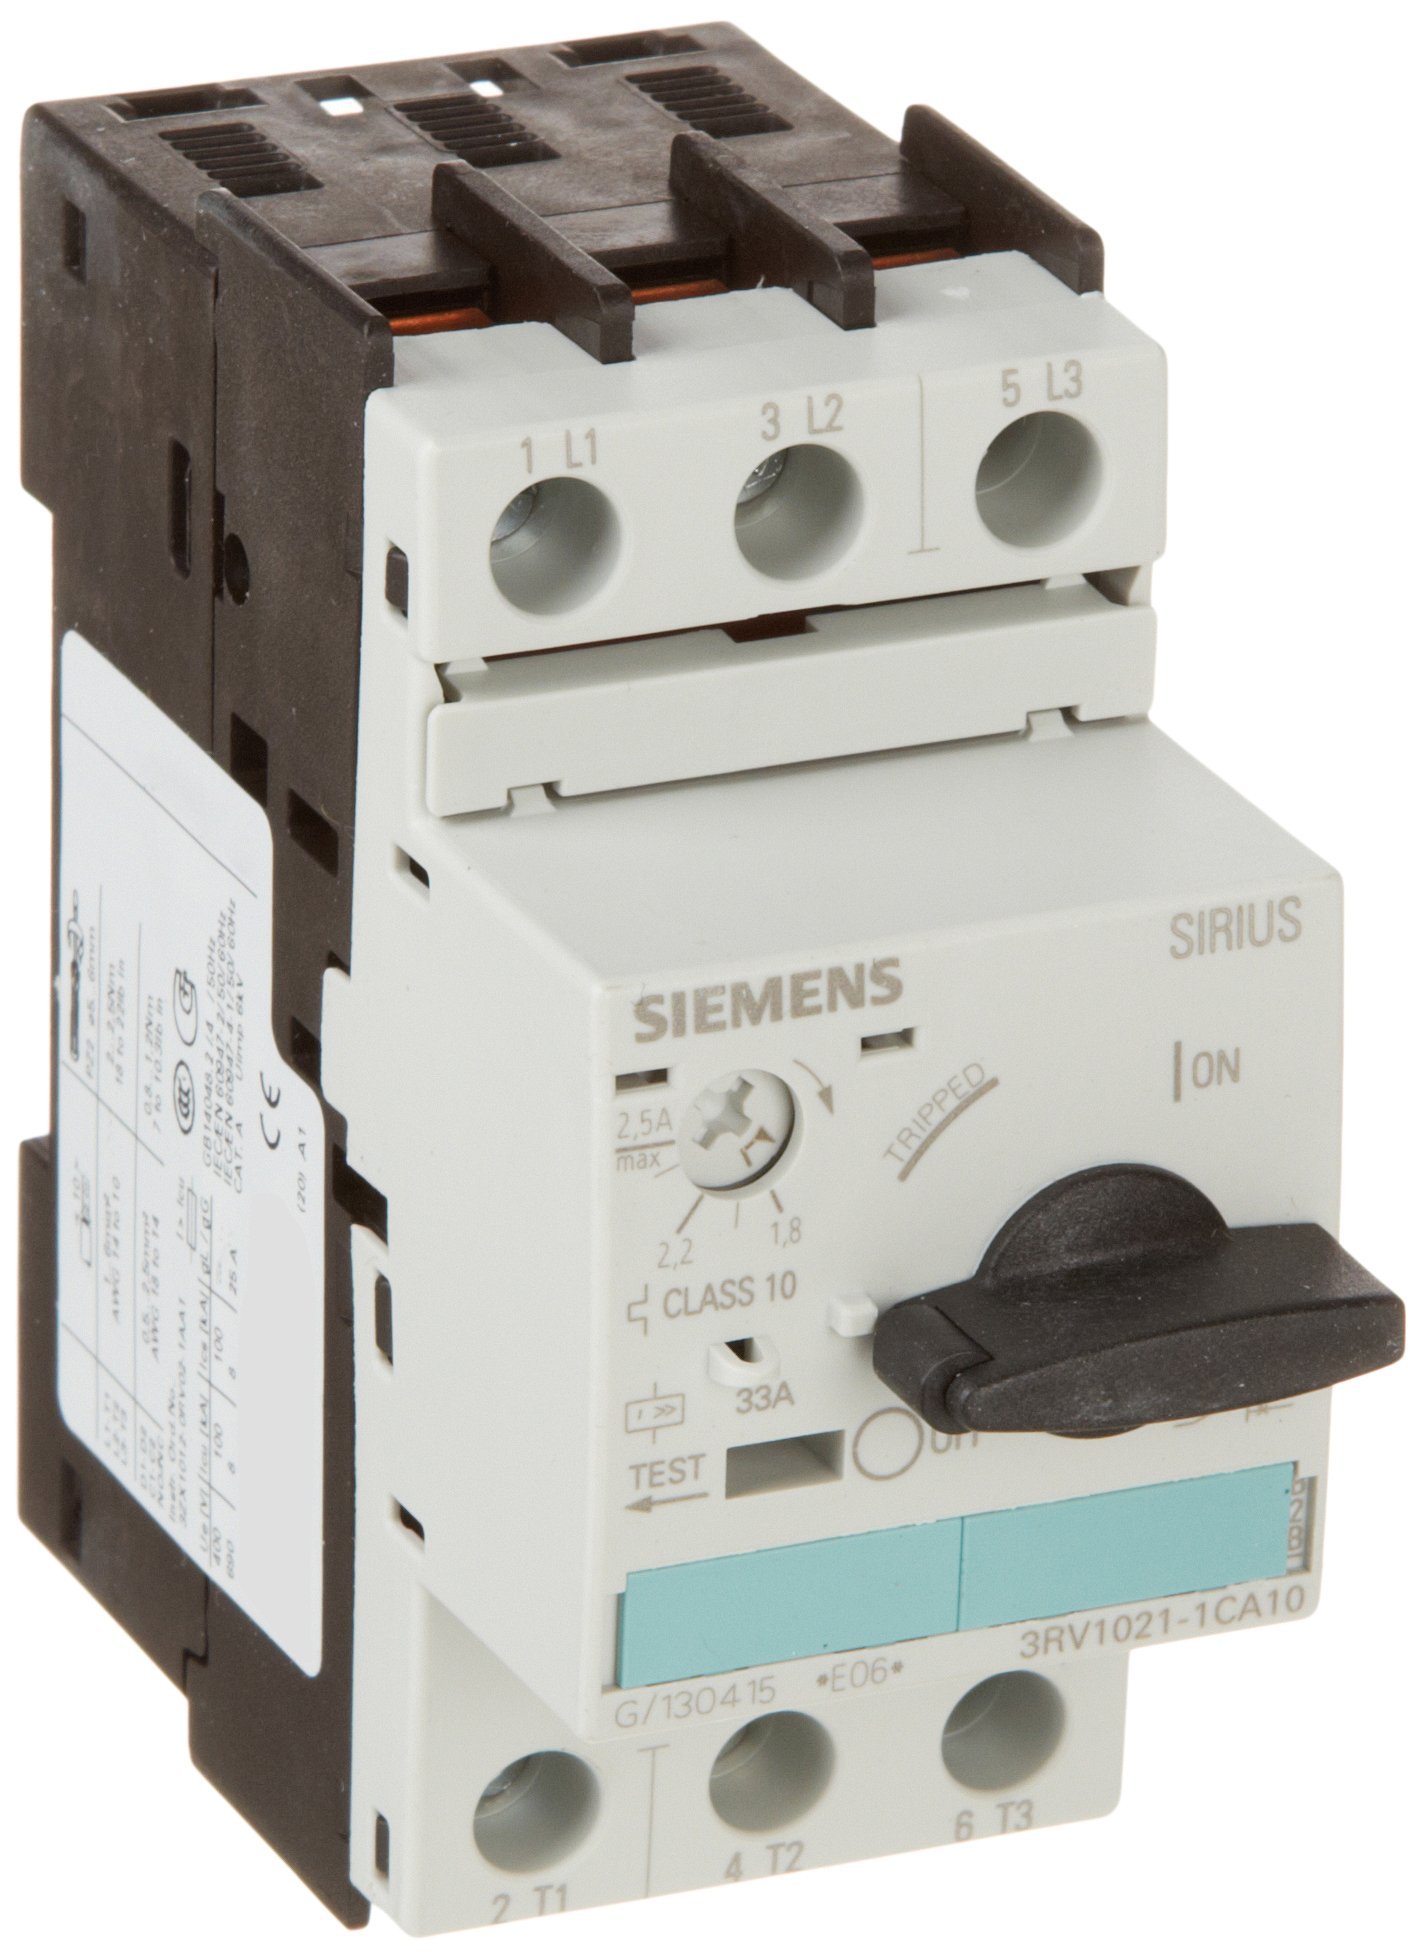 Siemens 3RV1021-1CA10 Manual Starter and Enclosure, Open Type, 1.8-2.5 FLA Adjustment Range